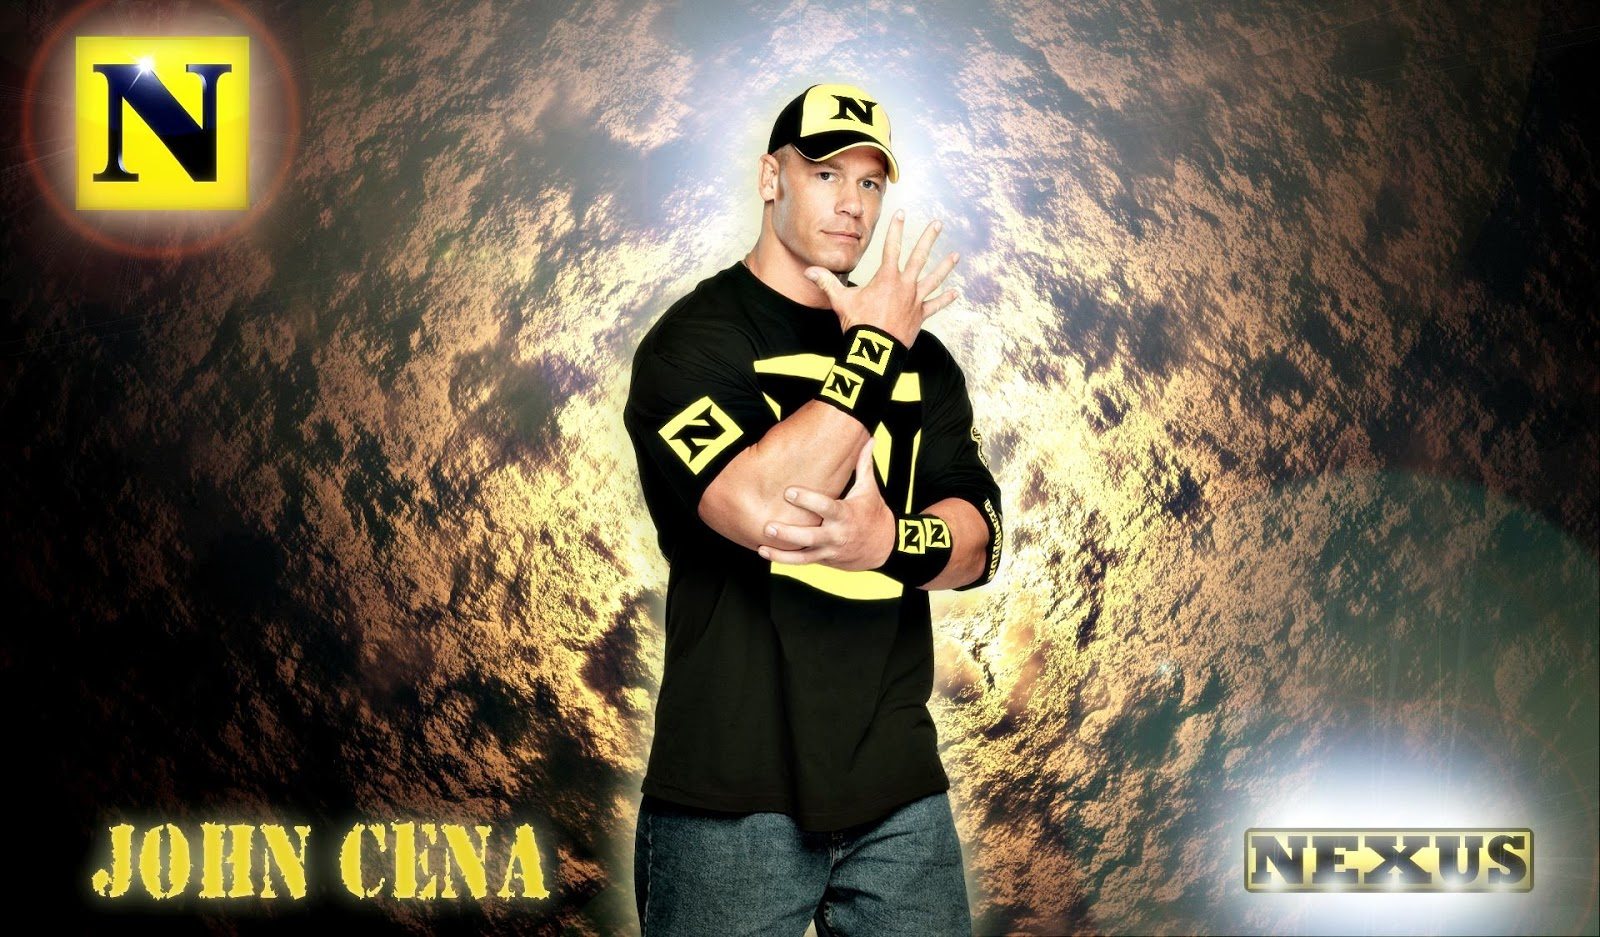 WWE Star Wallpaper John Cena HD